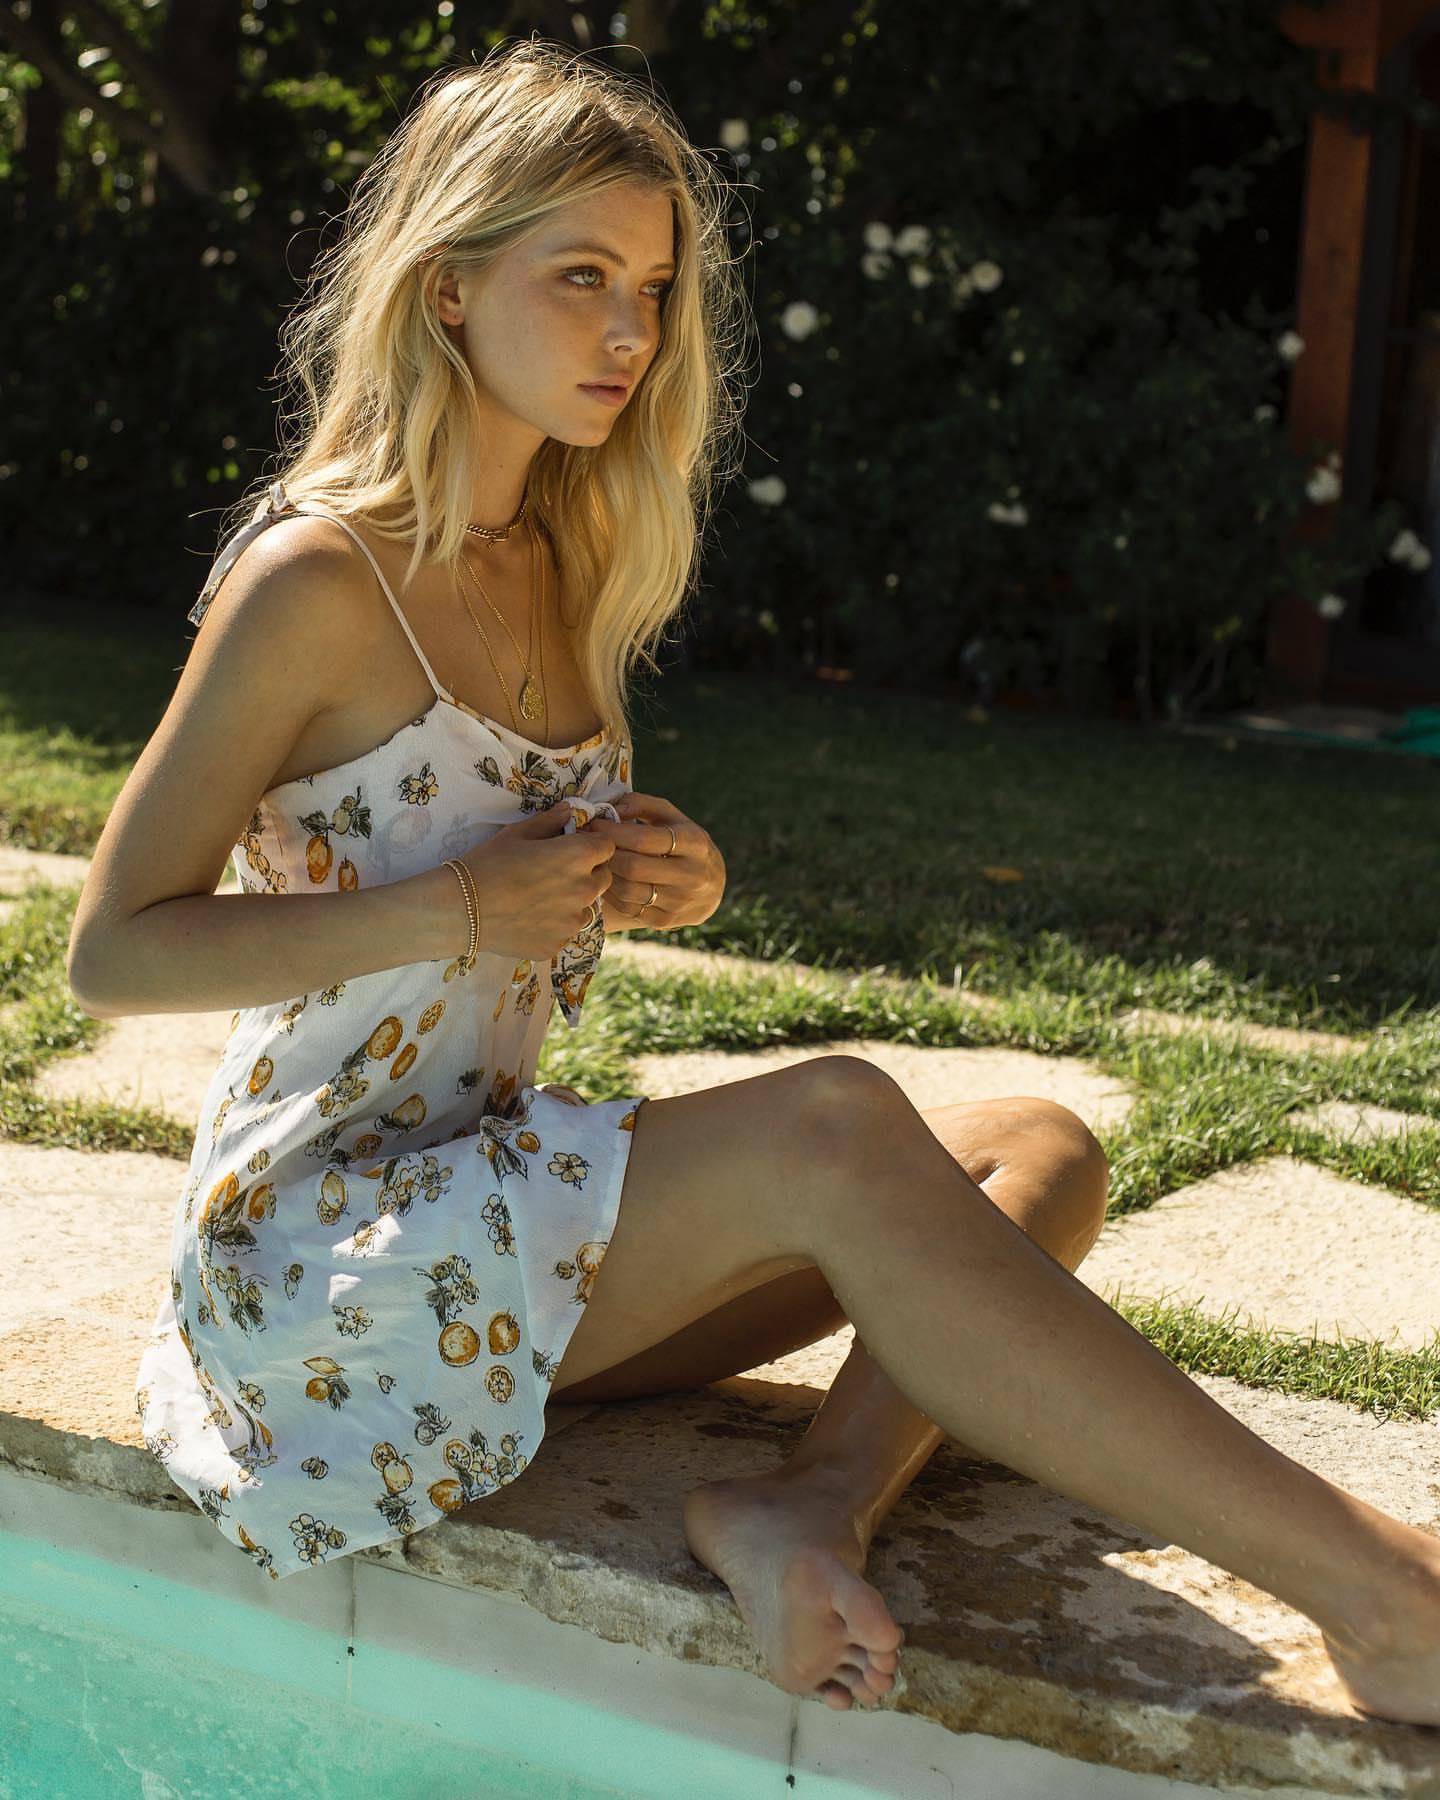 People 1440x1800 Baskin Champion women blonde model long hair dress sitting profile women outdoors